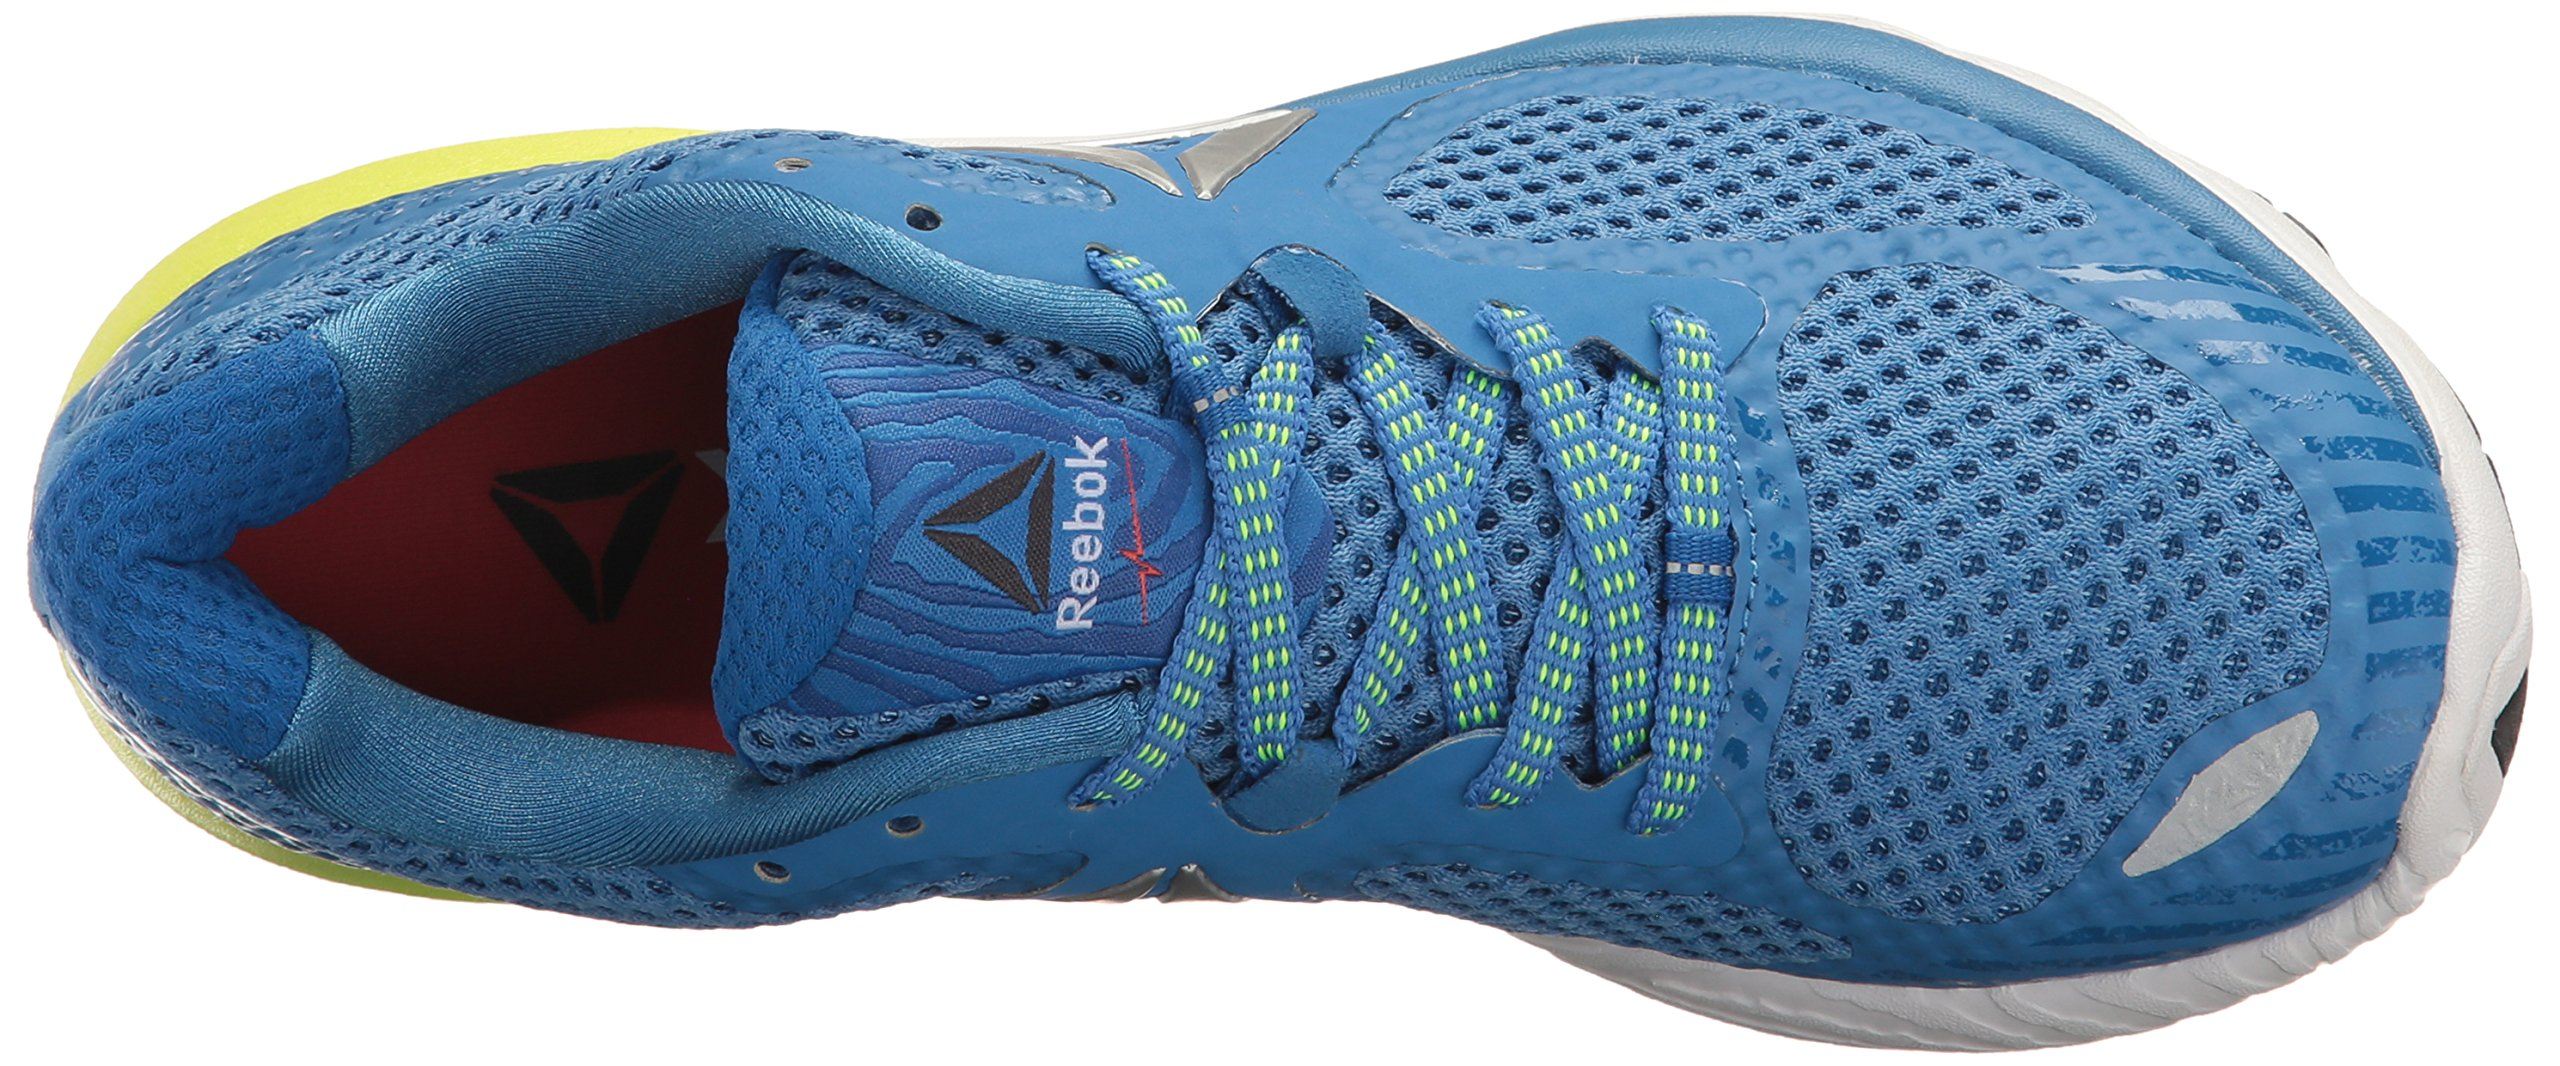 Reebok Women's Harmony Road Running Shoe